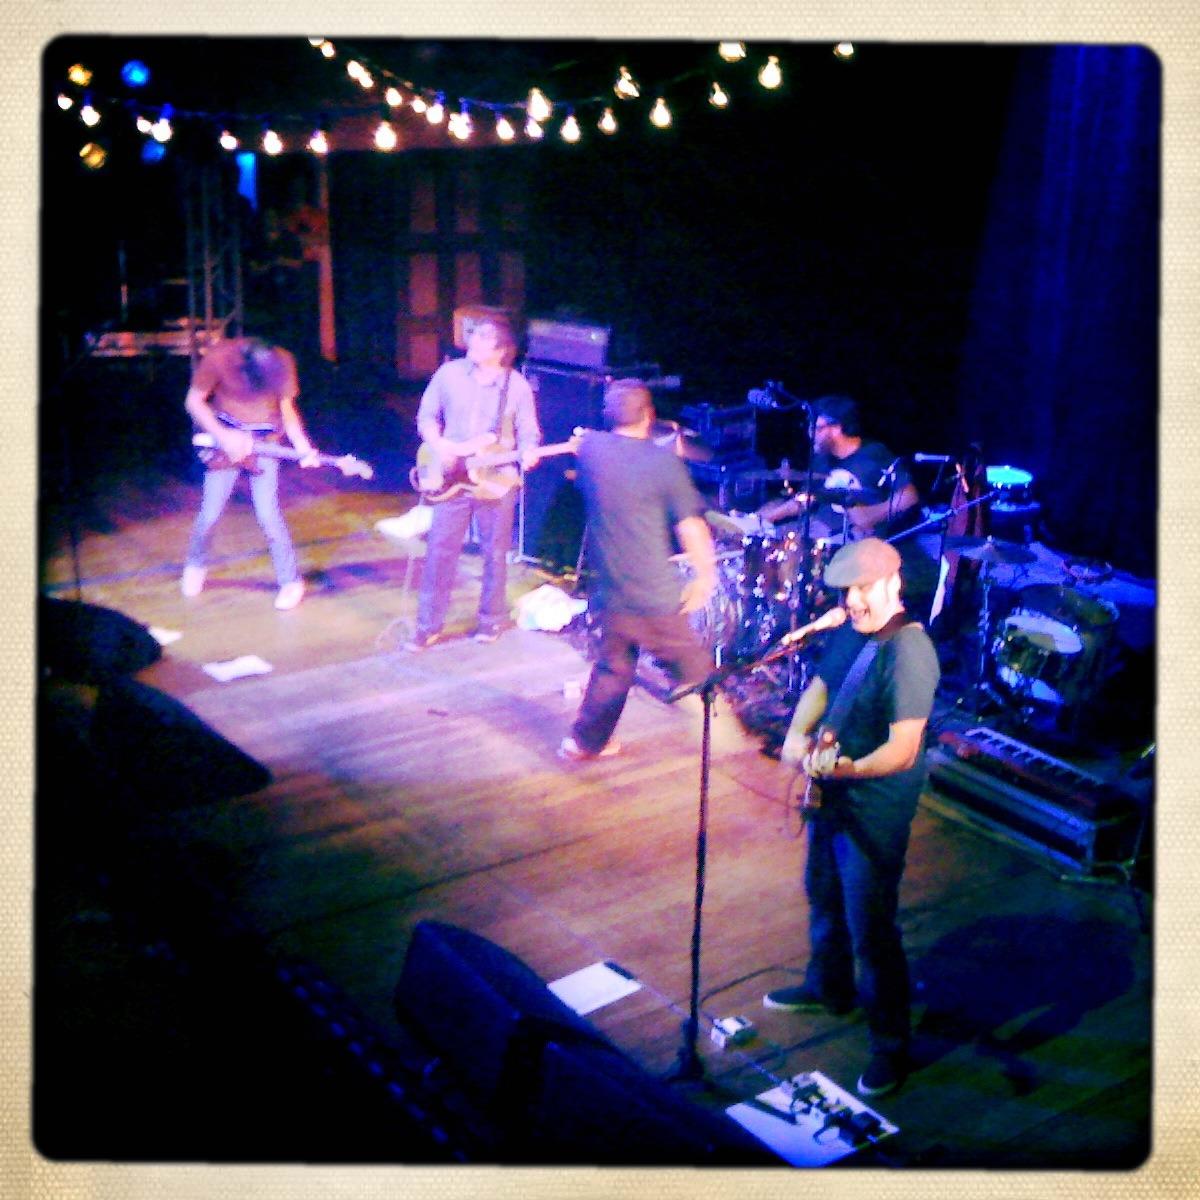 Pavement 2010 Reunion Begins